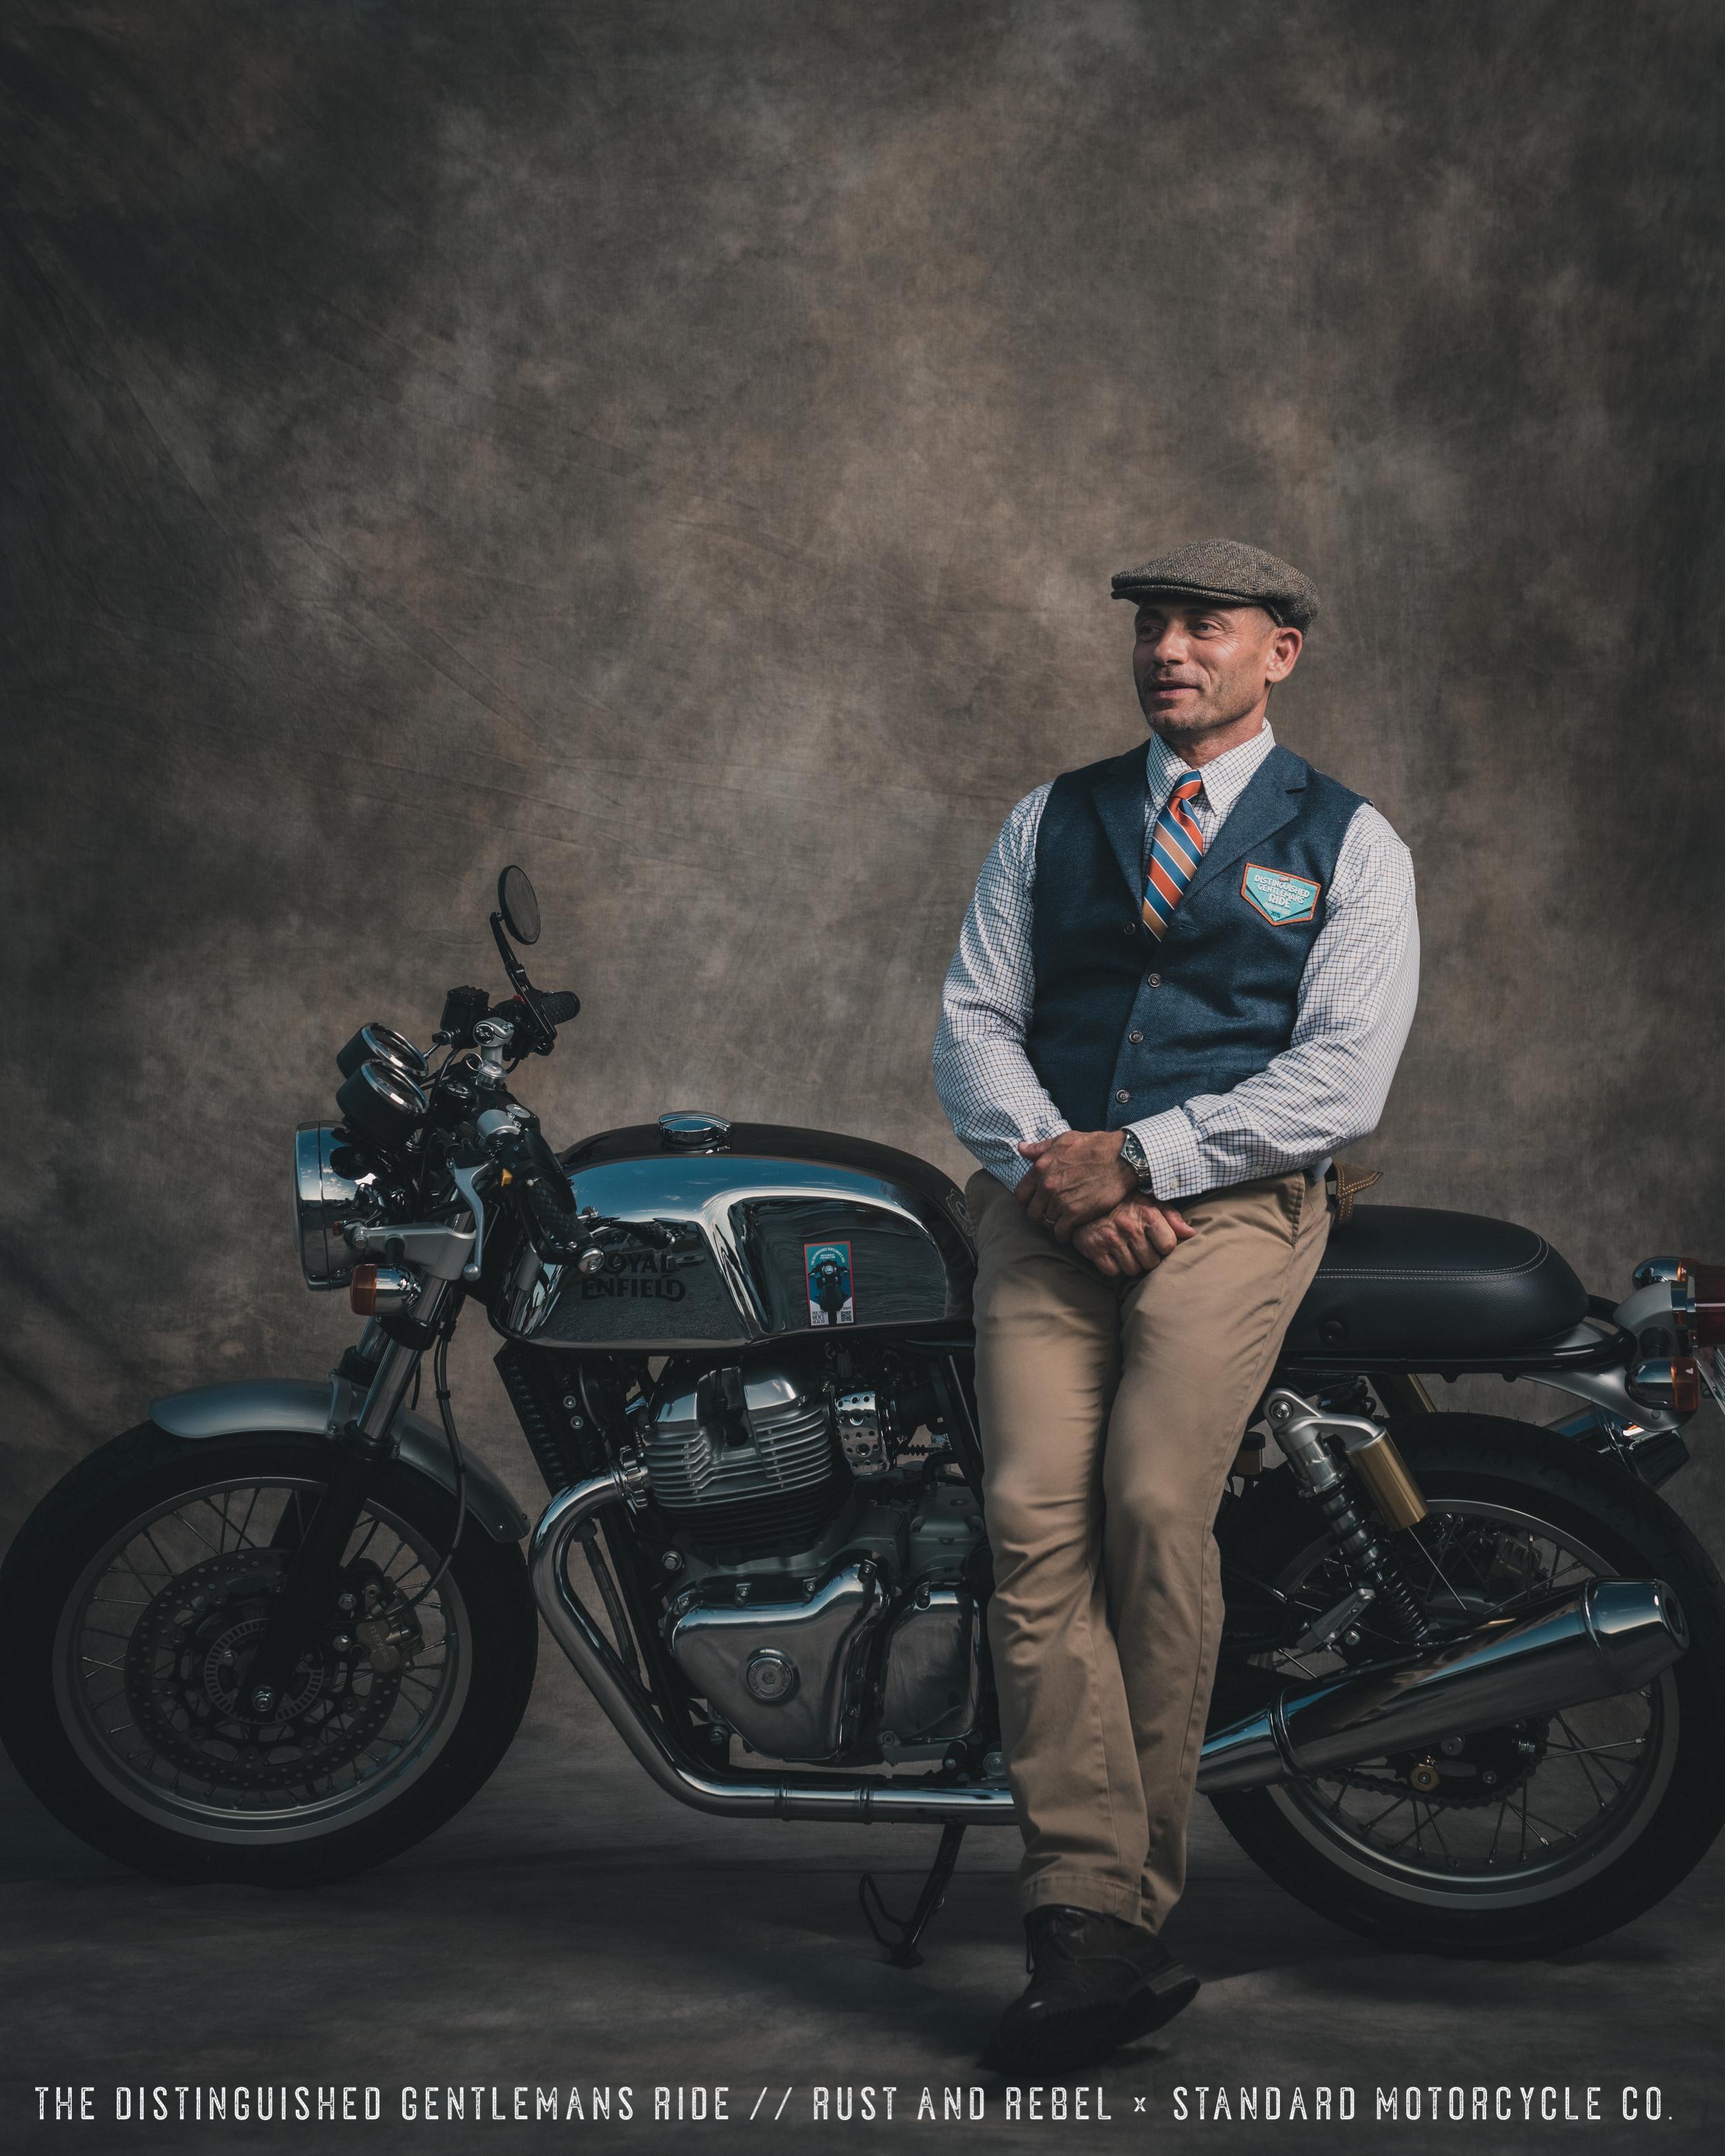 The Distinguished Gentleman's Ride 2019 [PEOPLE - PHOTO BY @MIKEDUNNUSA] - 0114.jpg